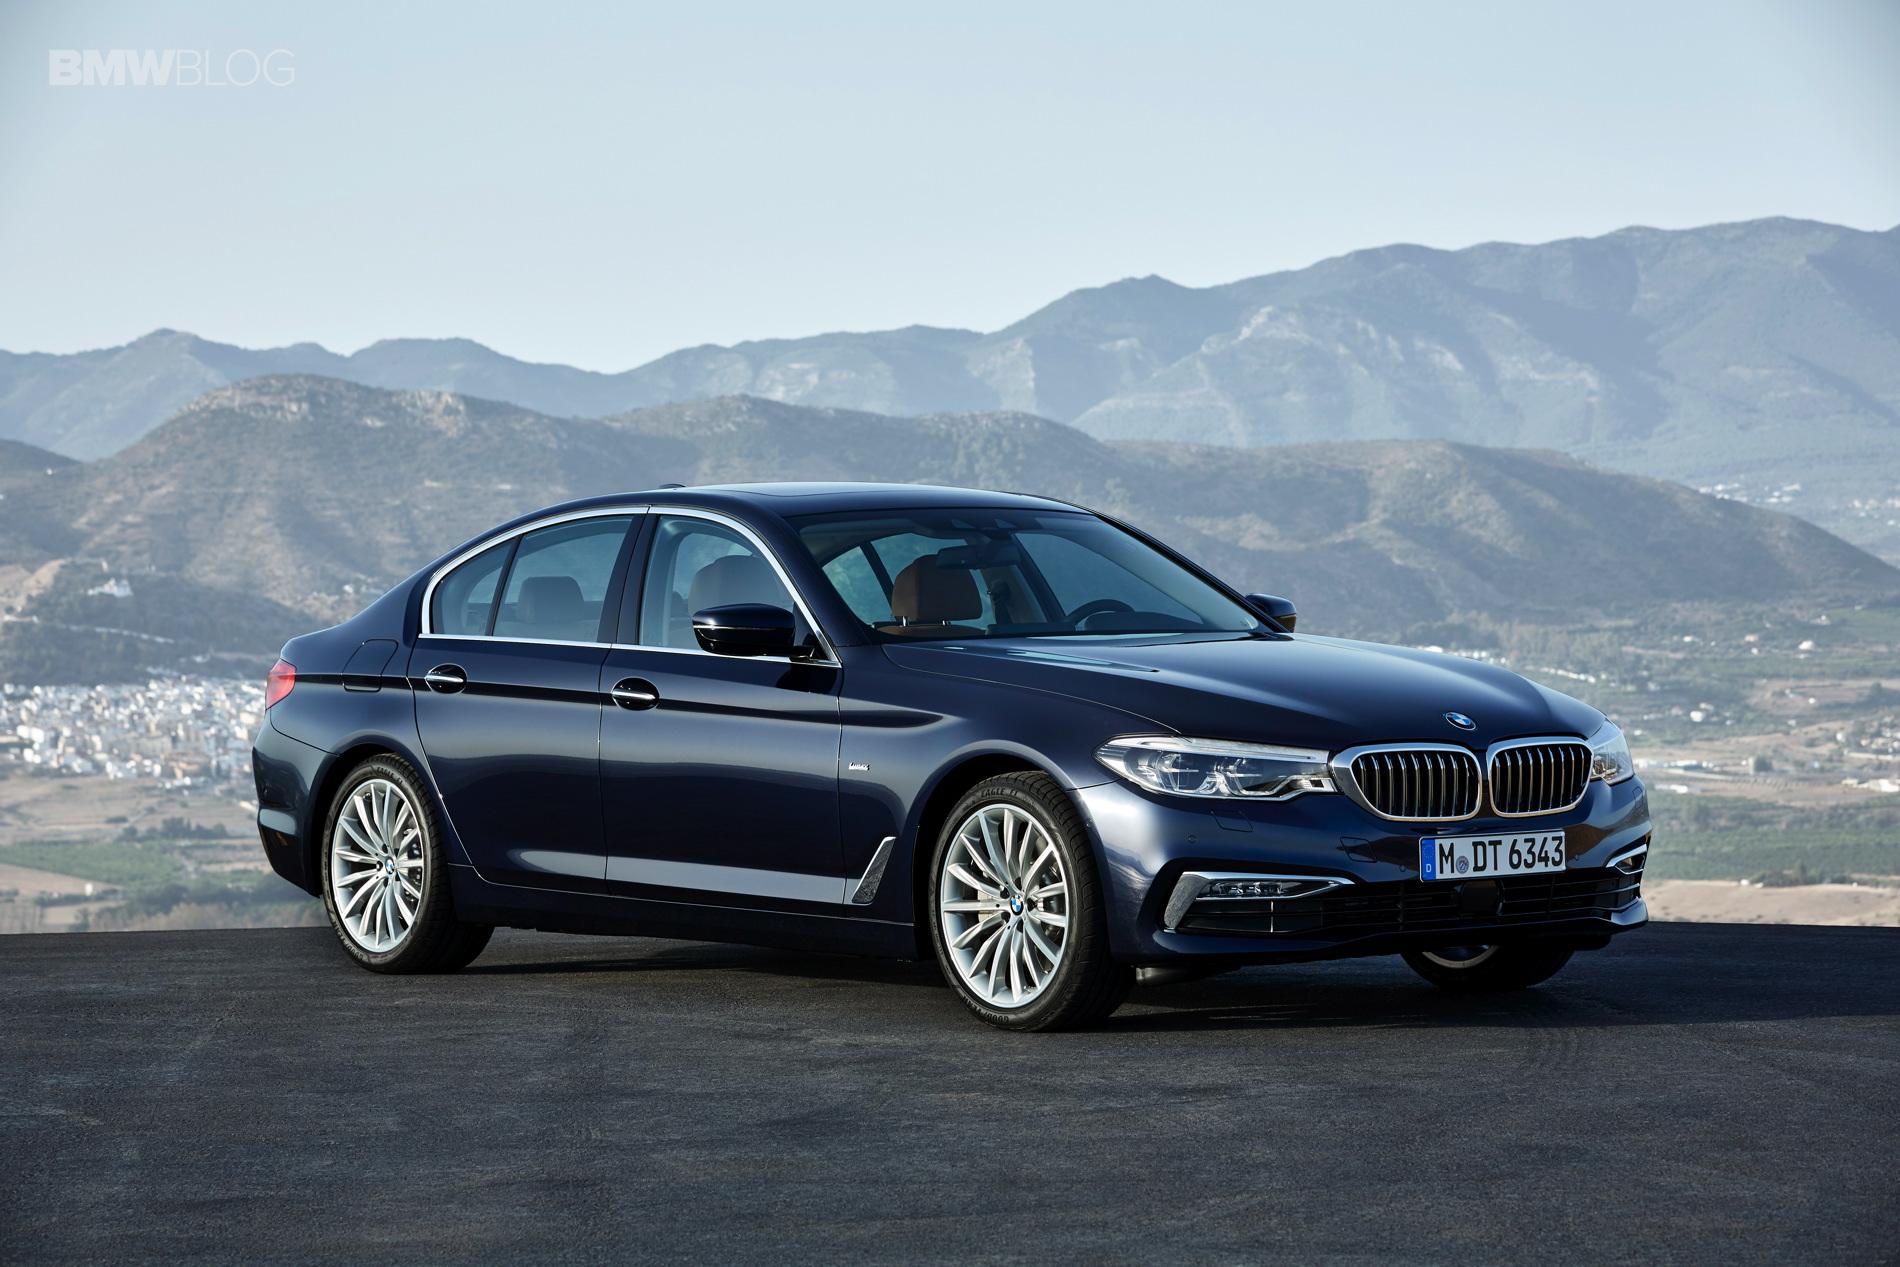 BMW G30 5 Series Luxury Line exterior 10